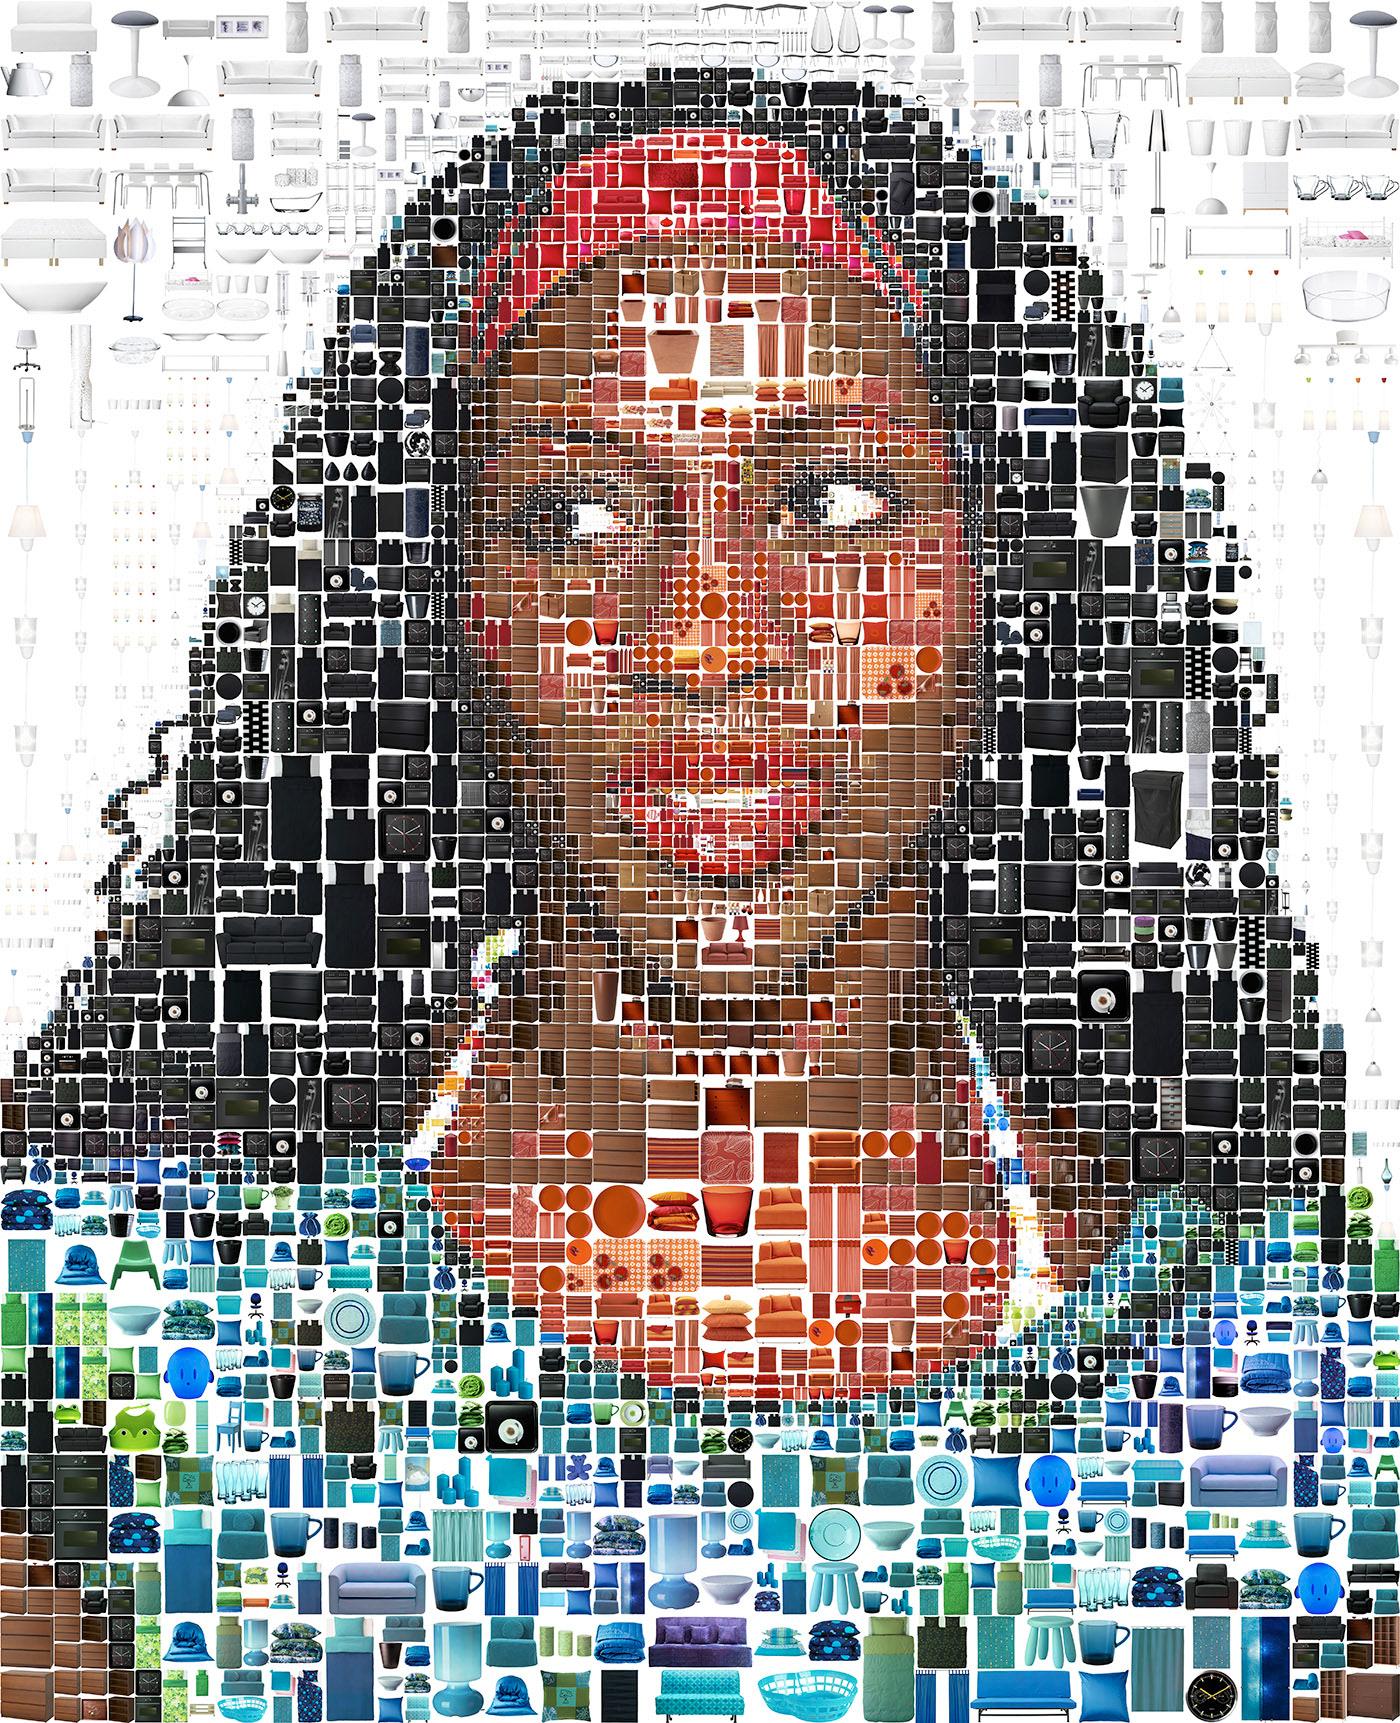 photomosaic visual design Advertising Campaign billboard gay african american social design photocollage computer graphics portraits